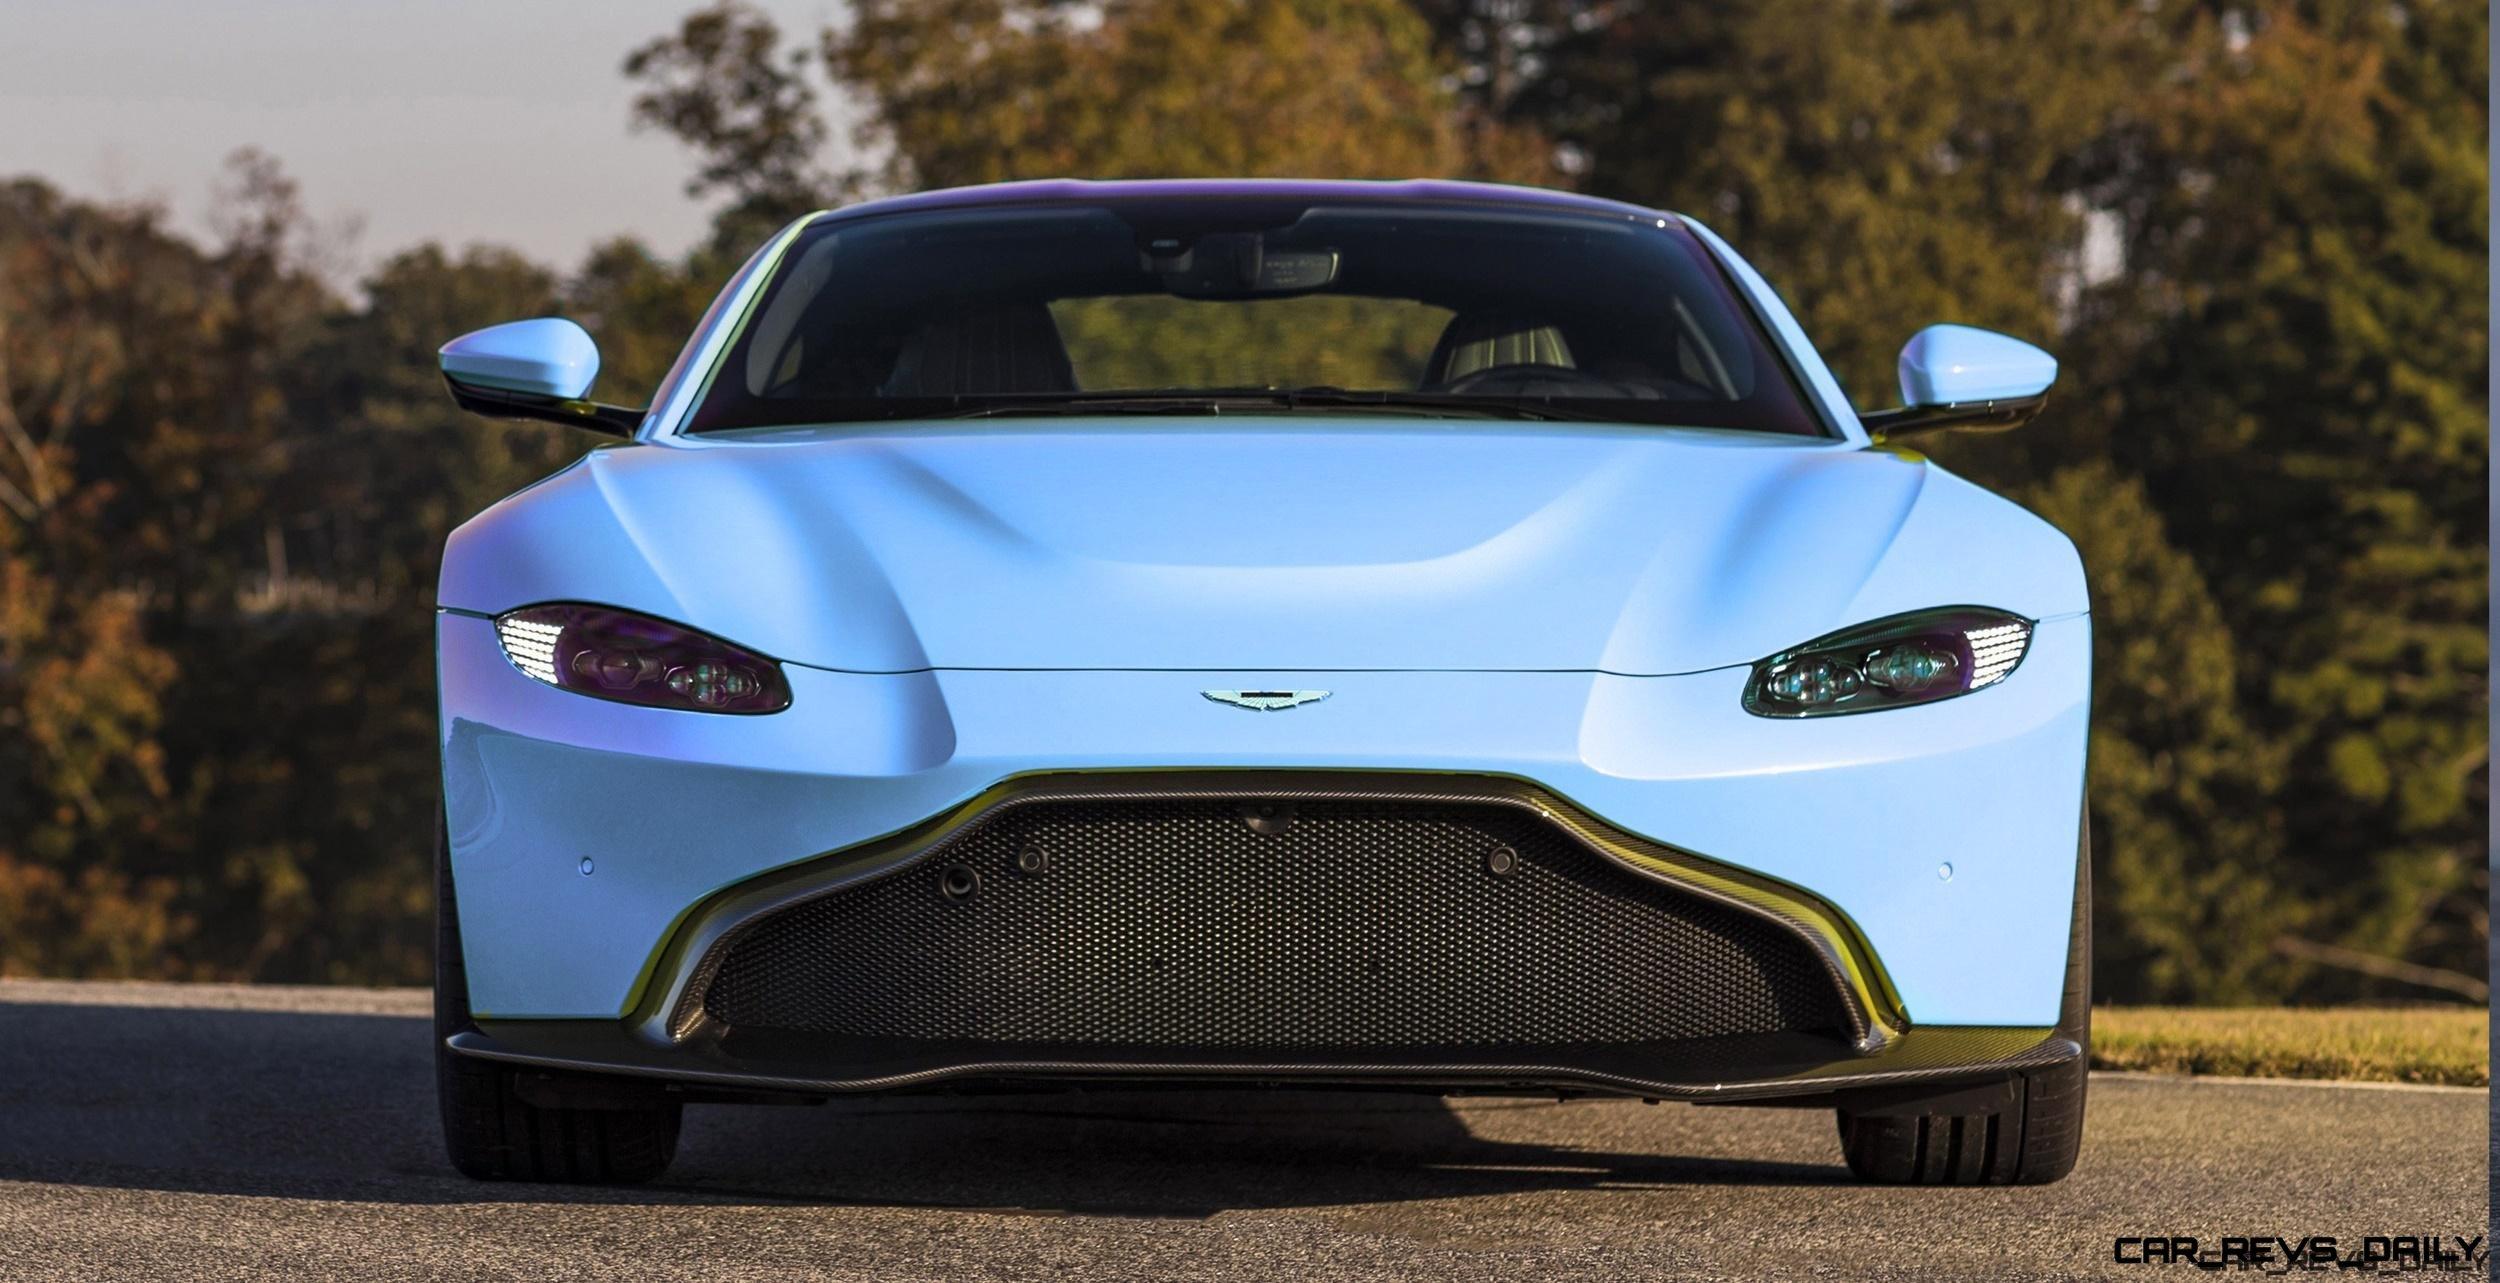 Aston-Martin-Vantage_Lime-Essence_01-tilebazsfd_003